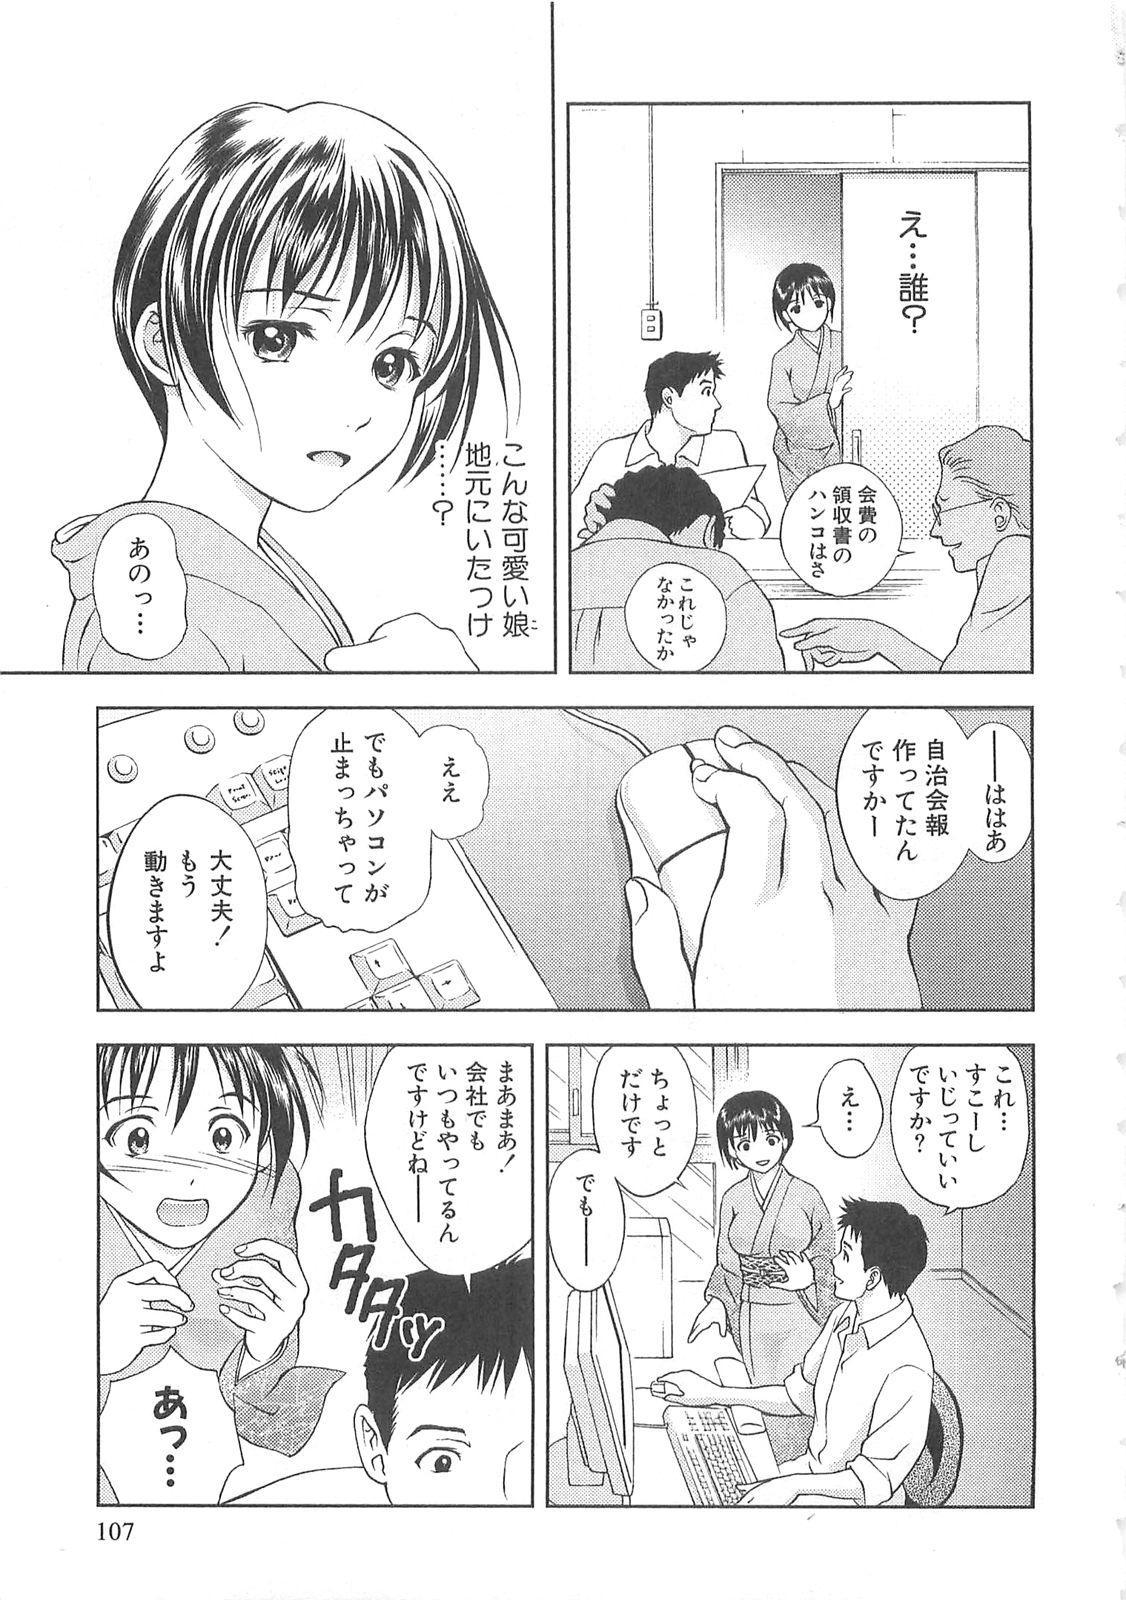 Tenshi no Kyuu - Angel's Pretty Hip 107